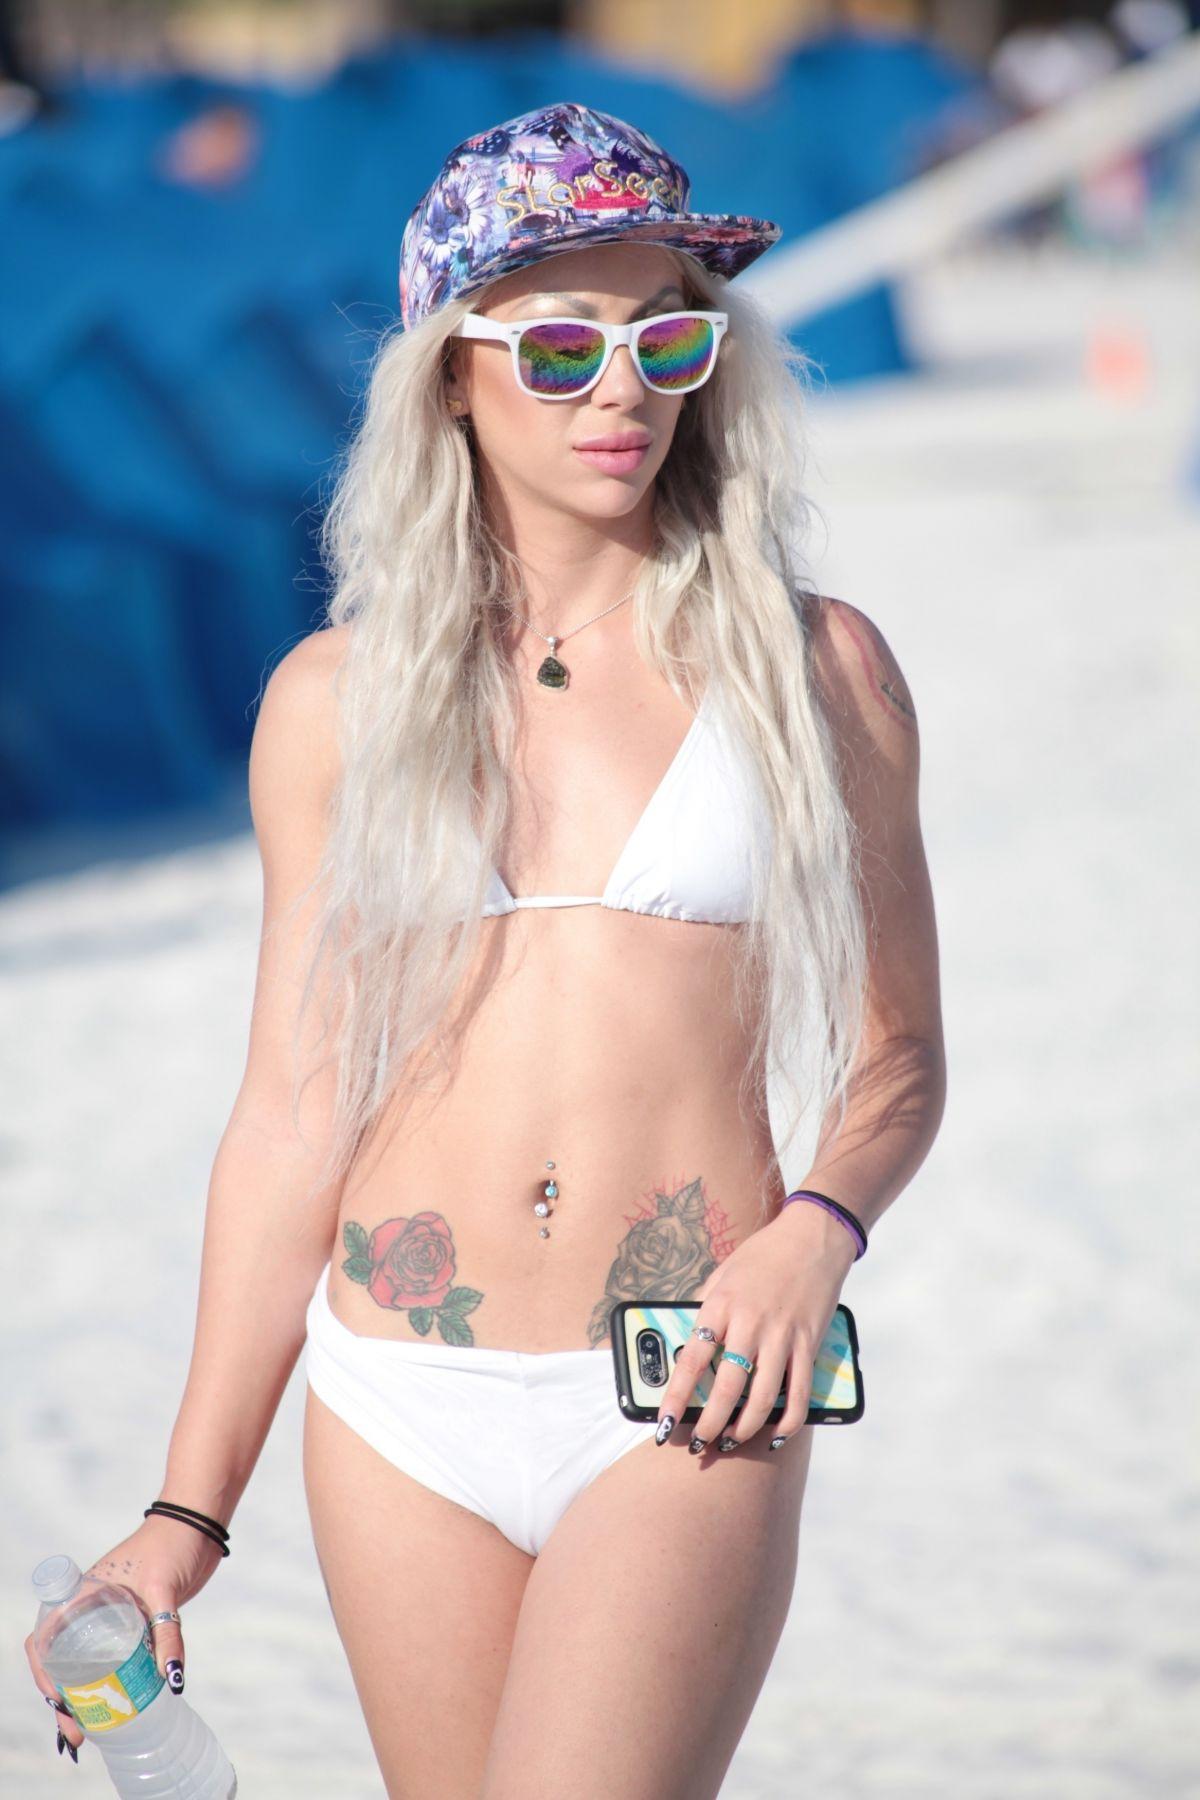 Lyra Rae